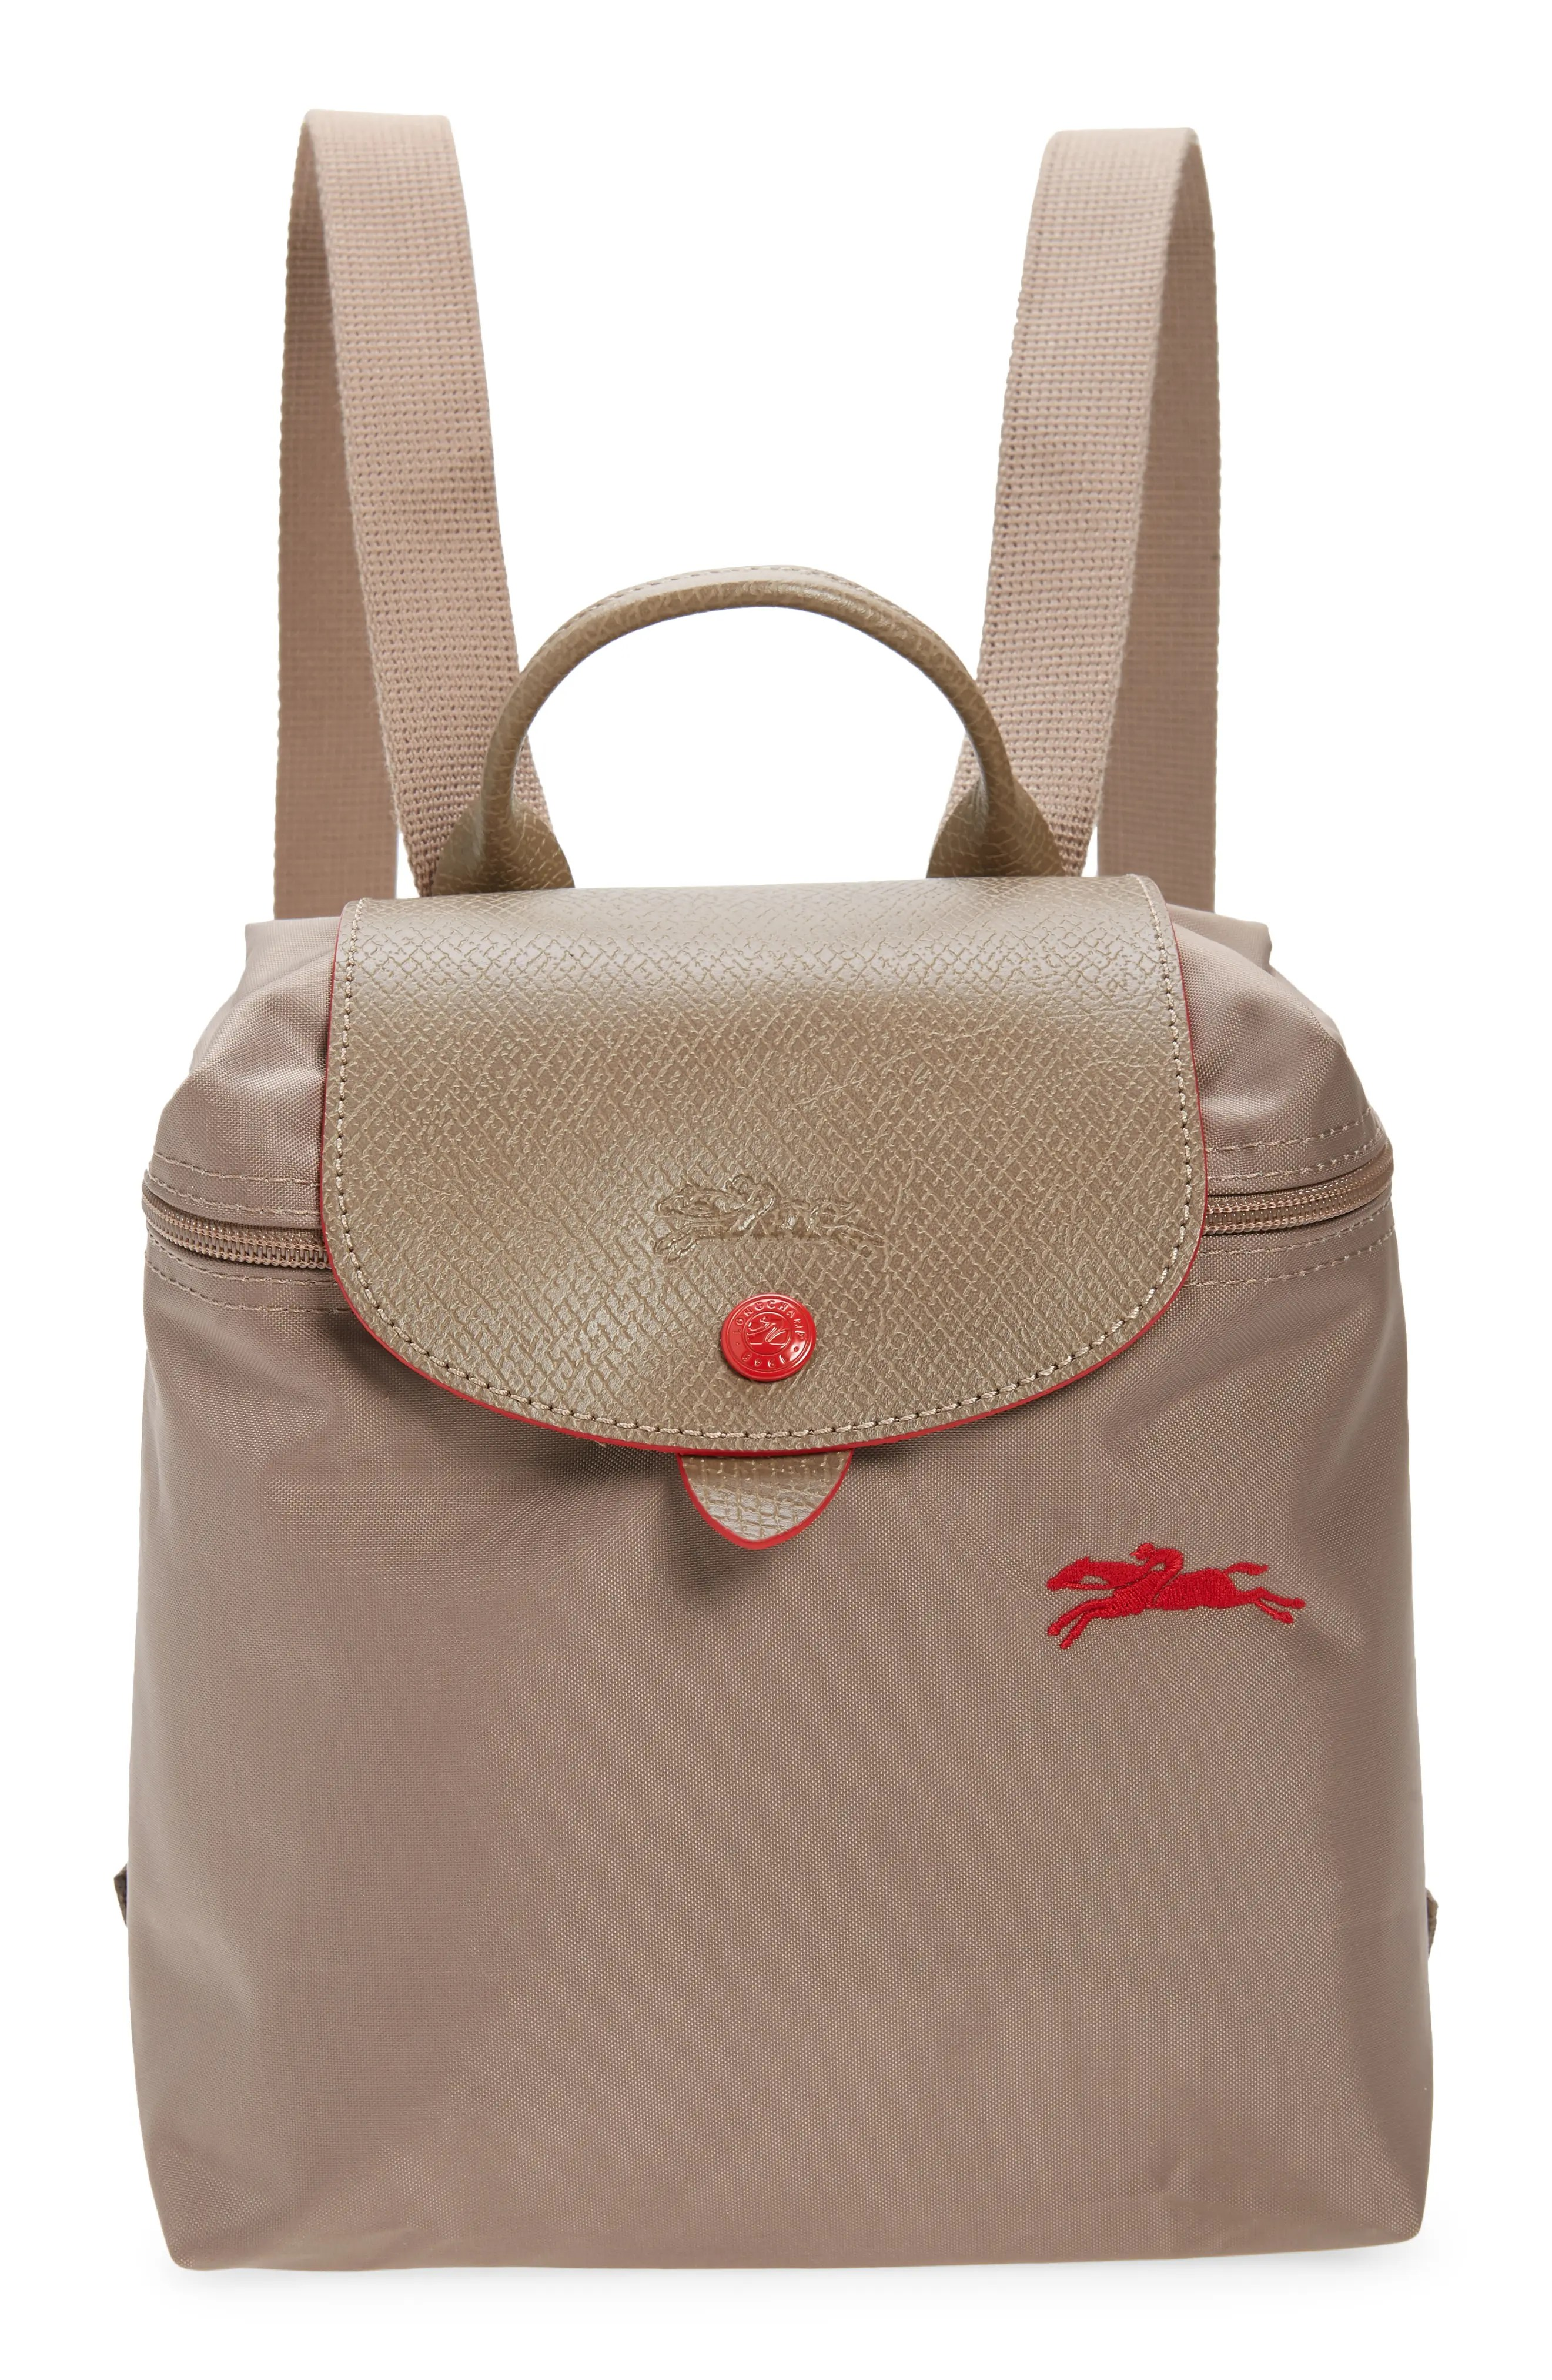 longchamp pliage mini size backpack nordstrom rack